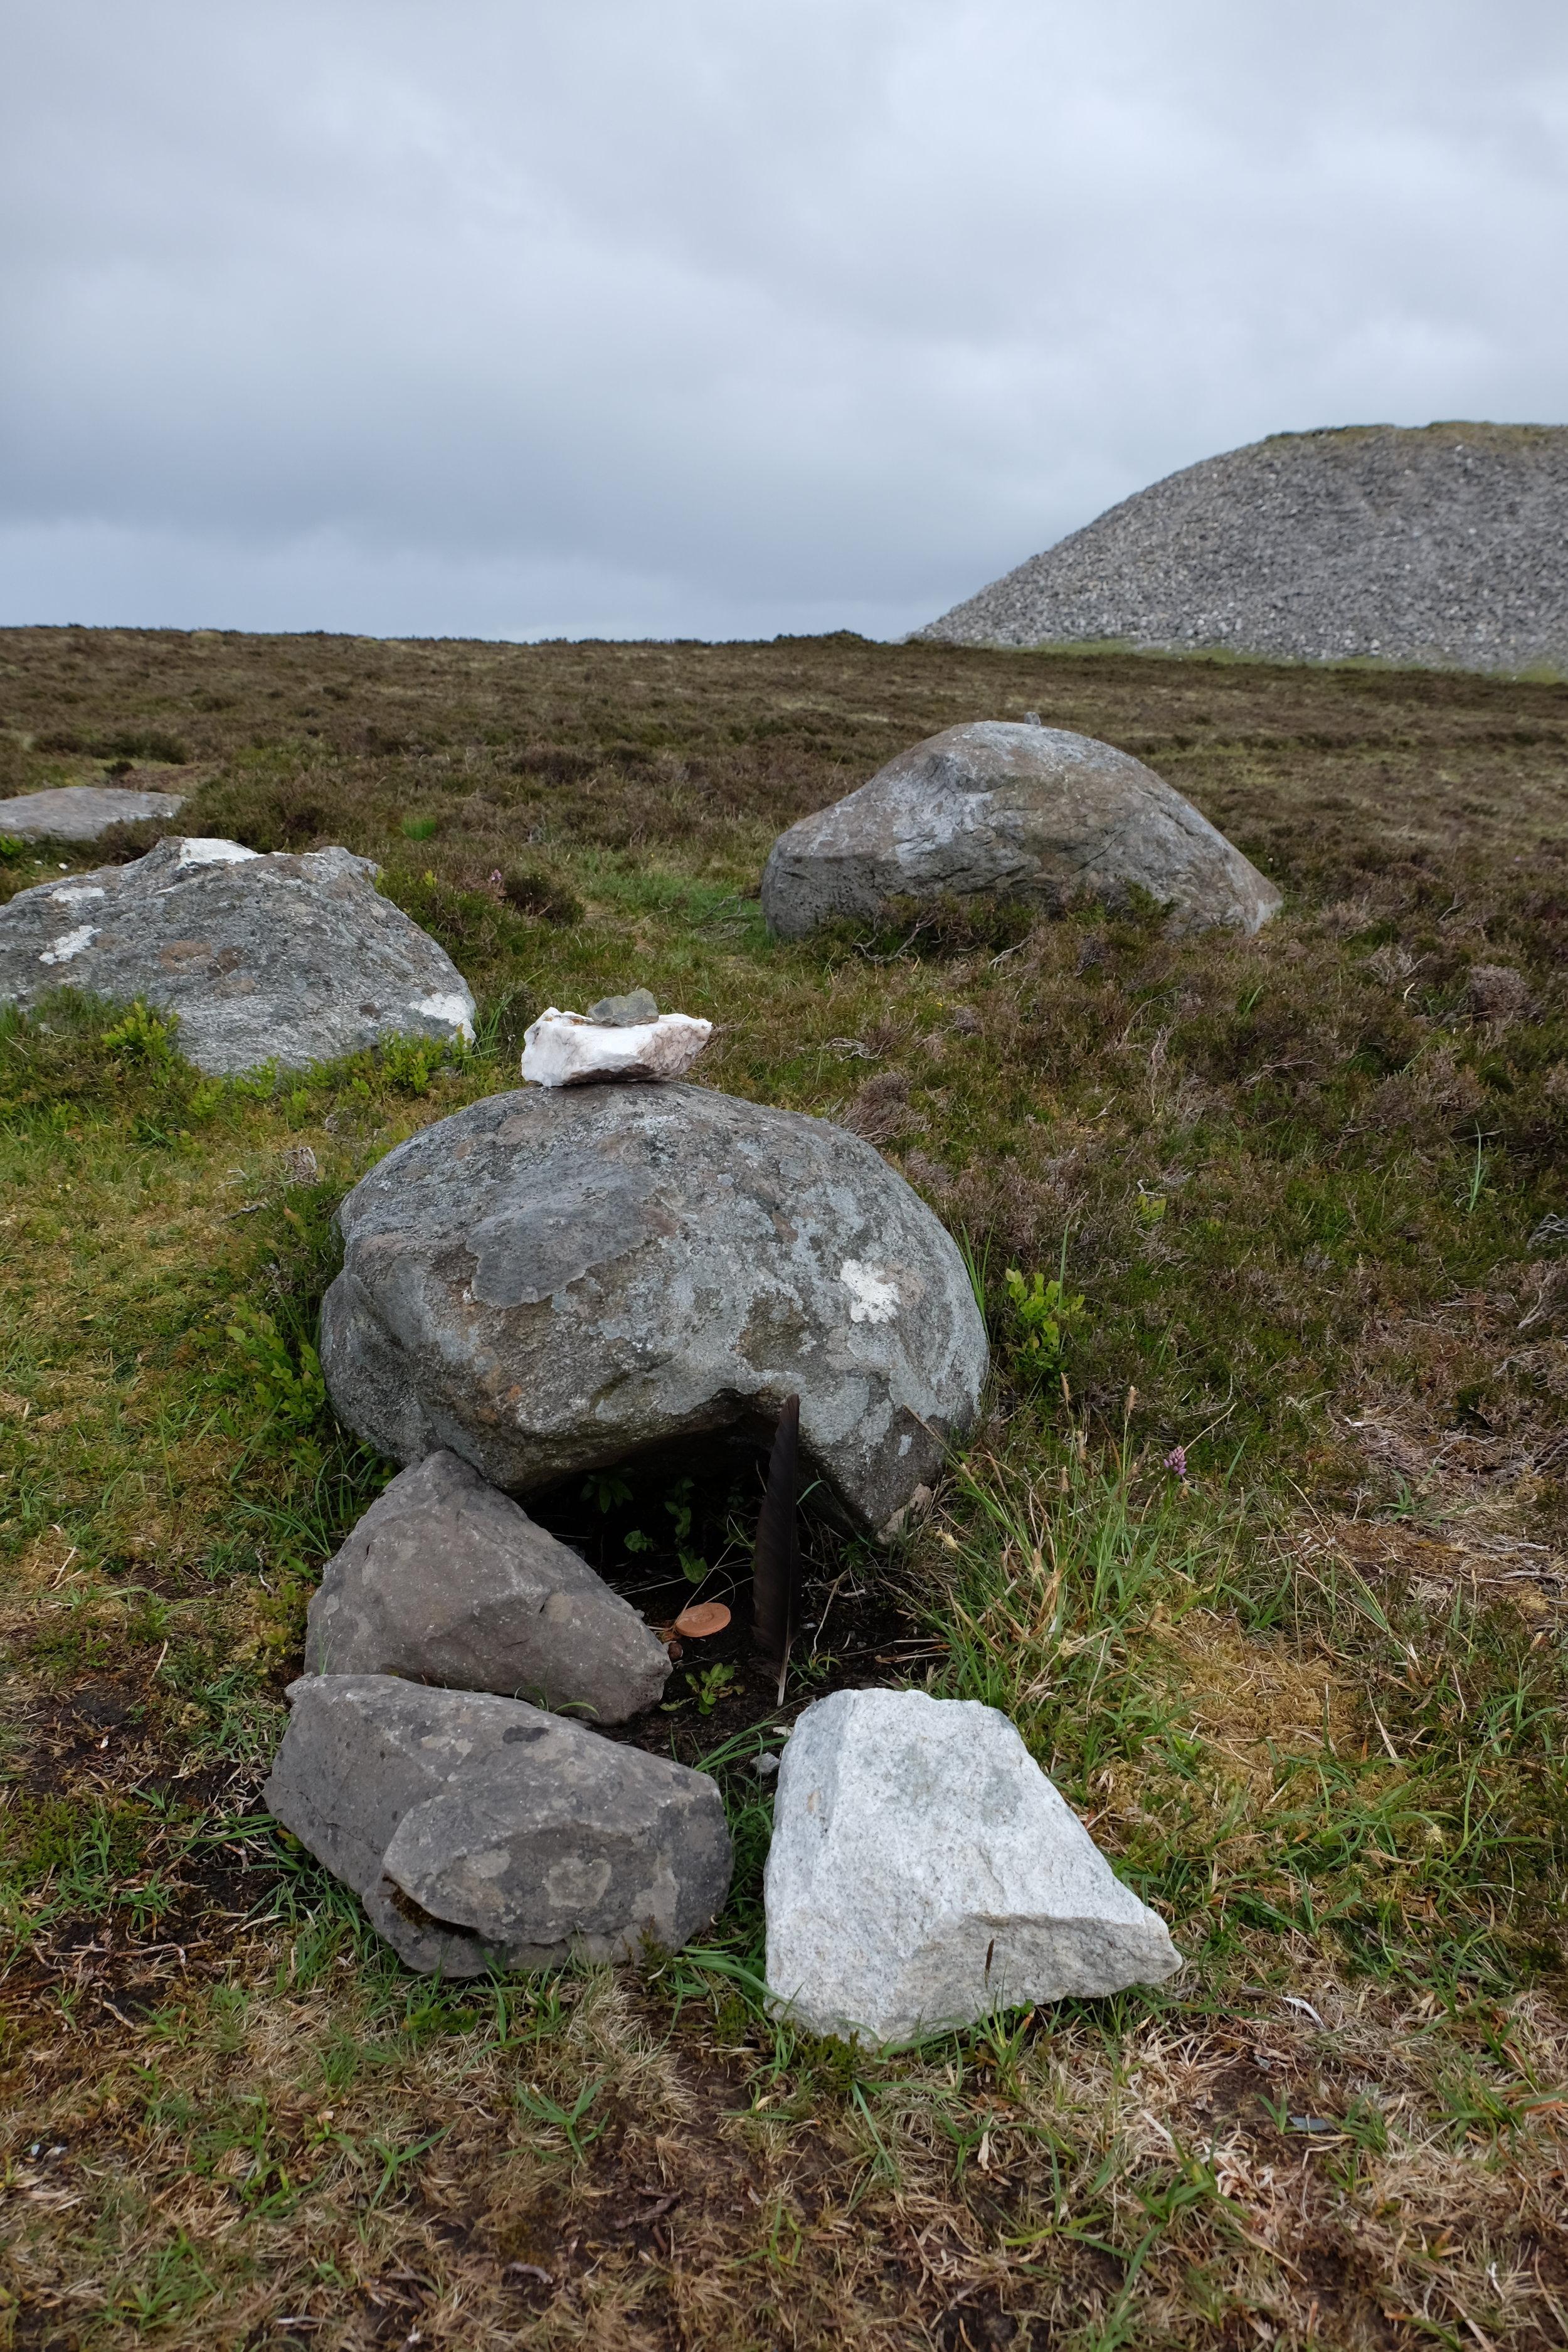 Queen Medb's cairn with offerings.